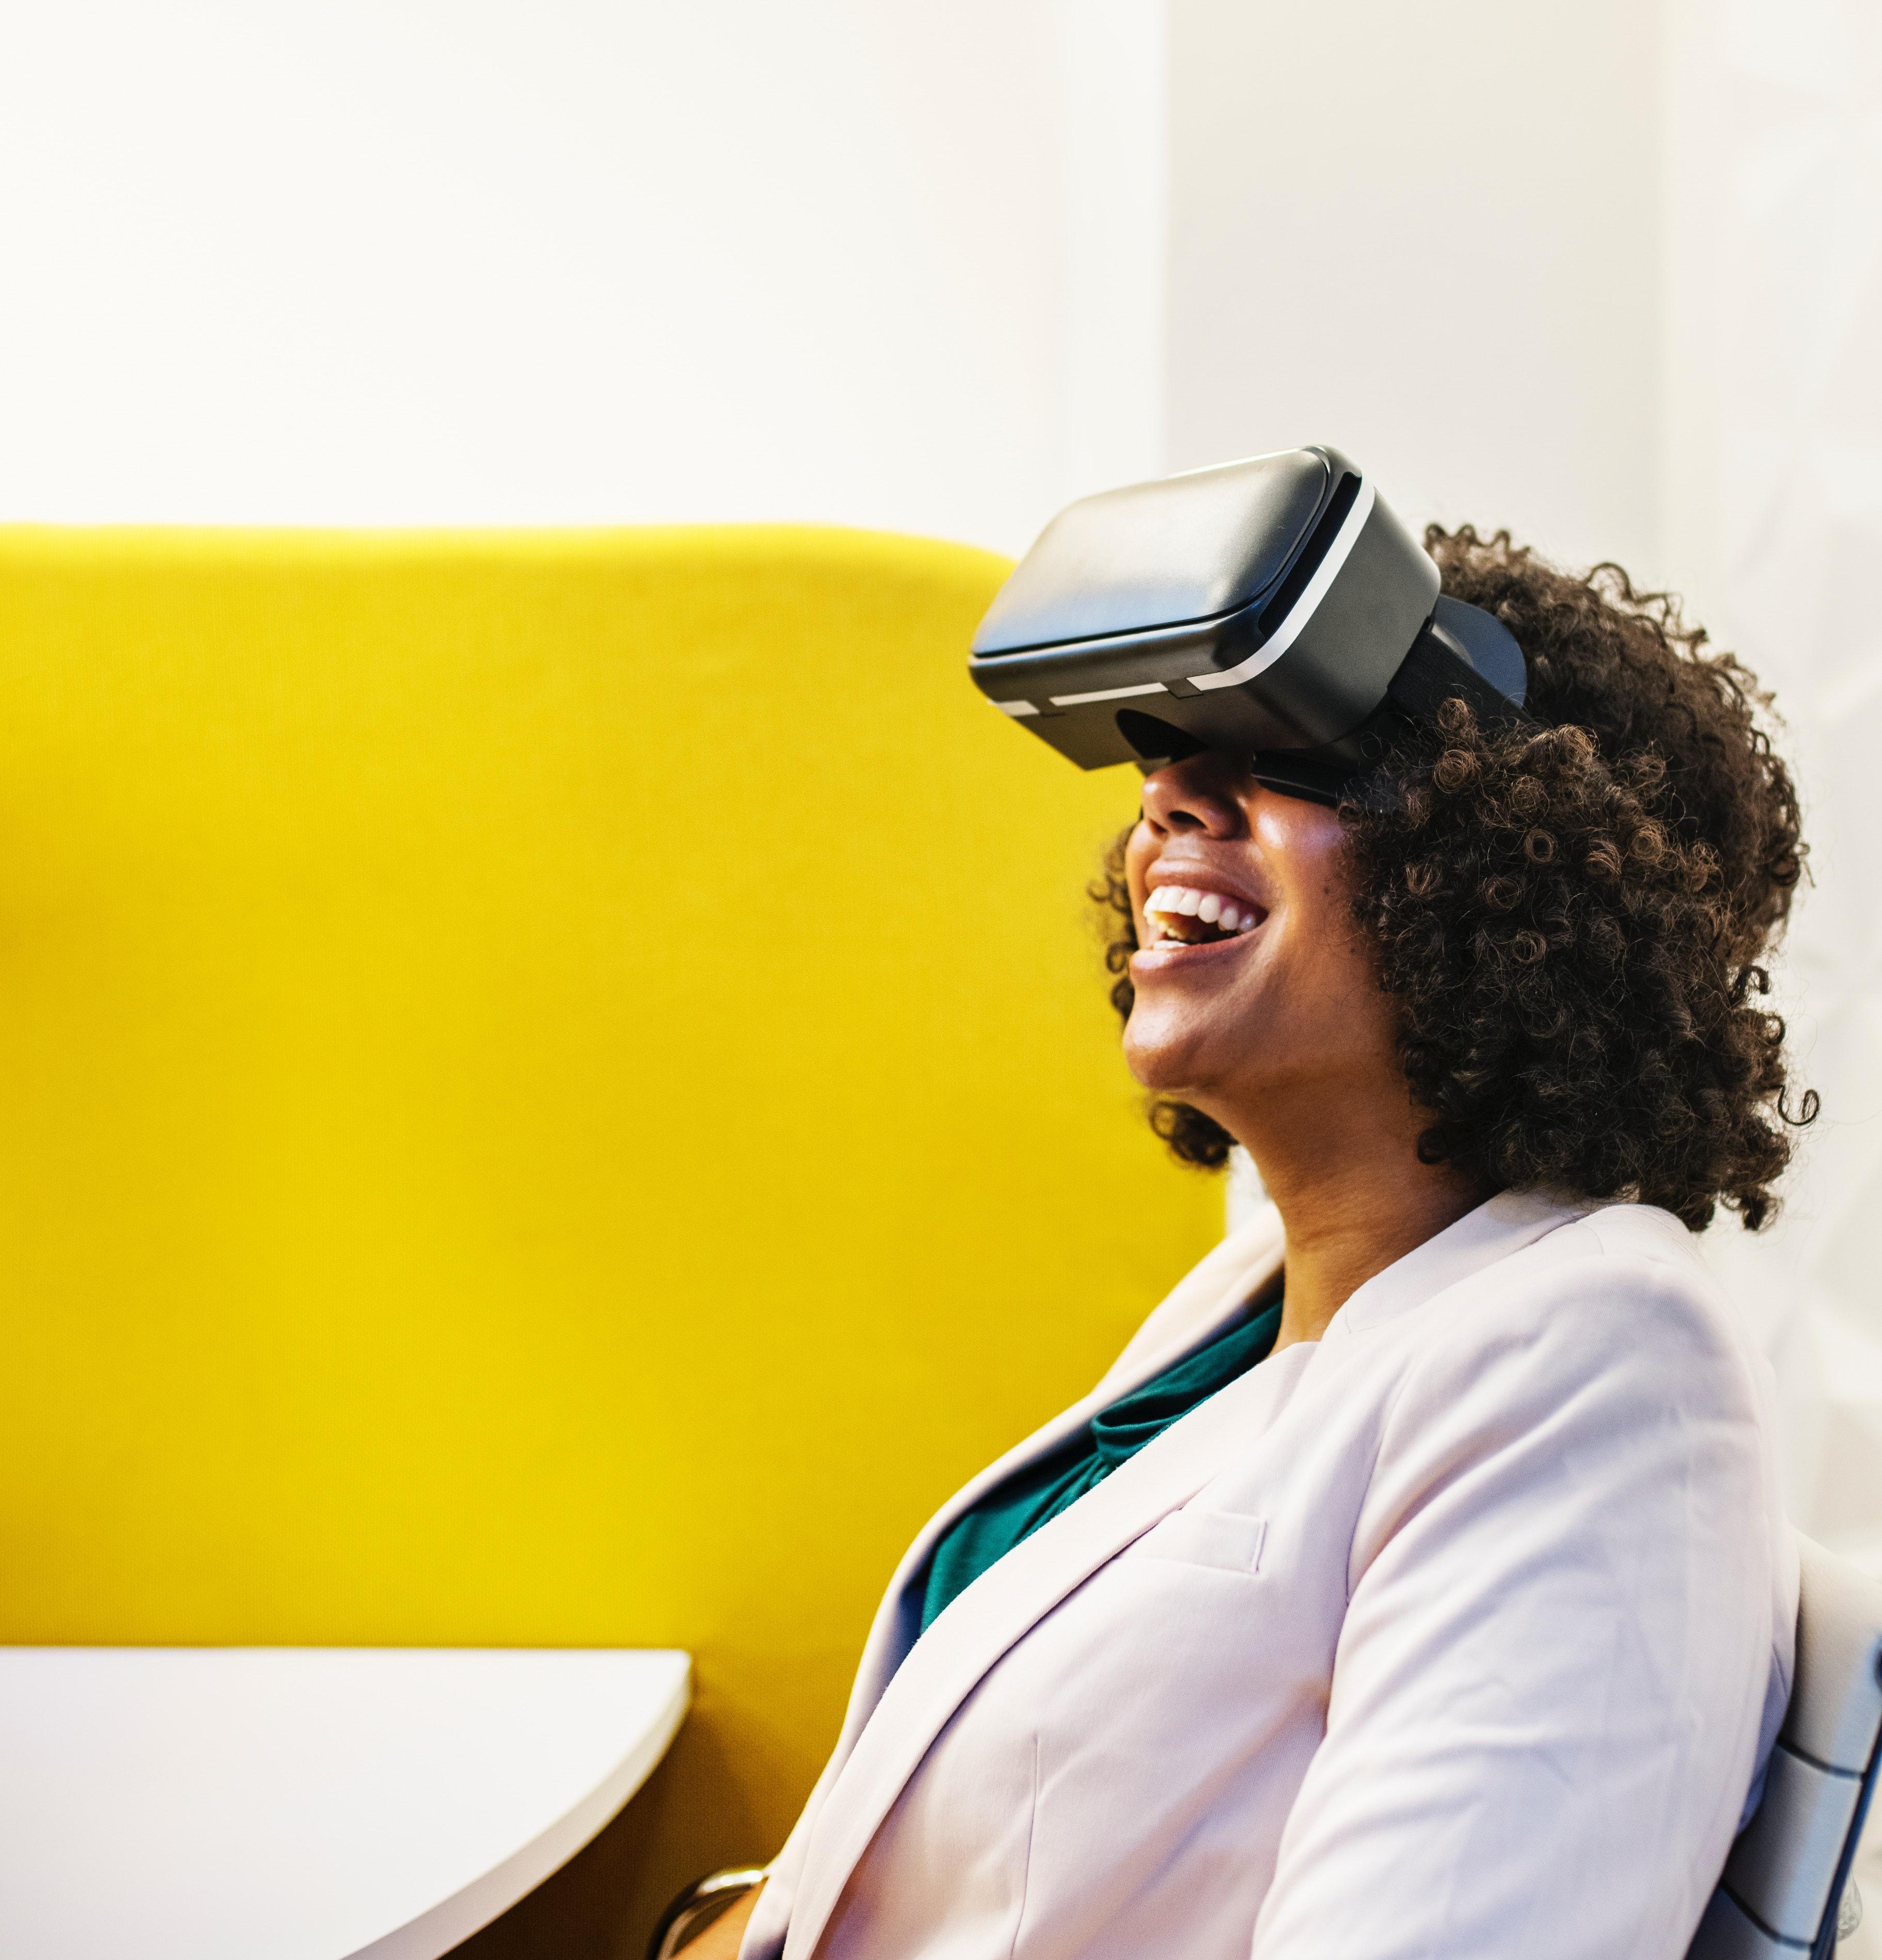 360-Virtual Reality